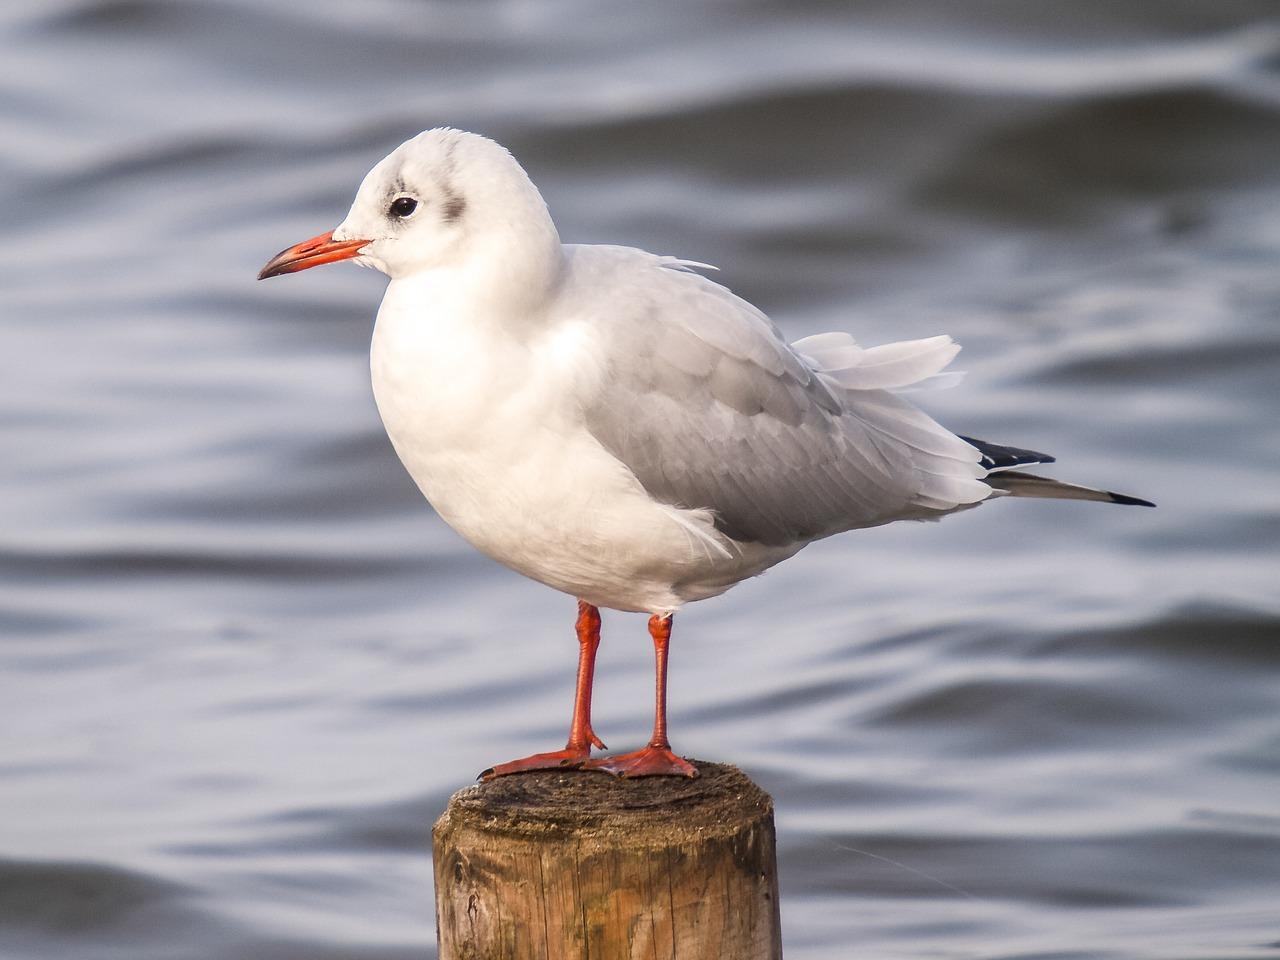 black headed gull, seagull, water bird